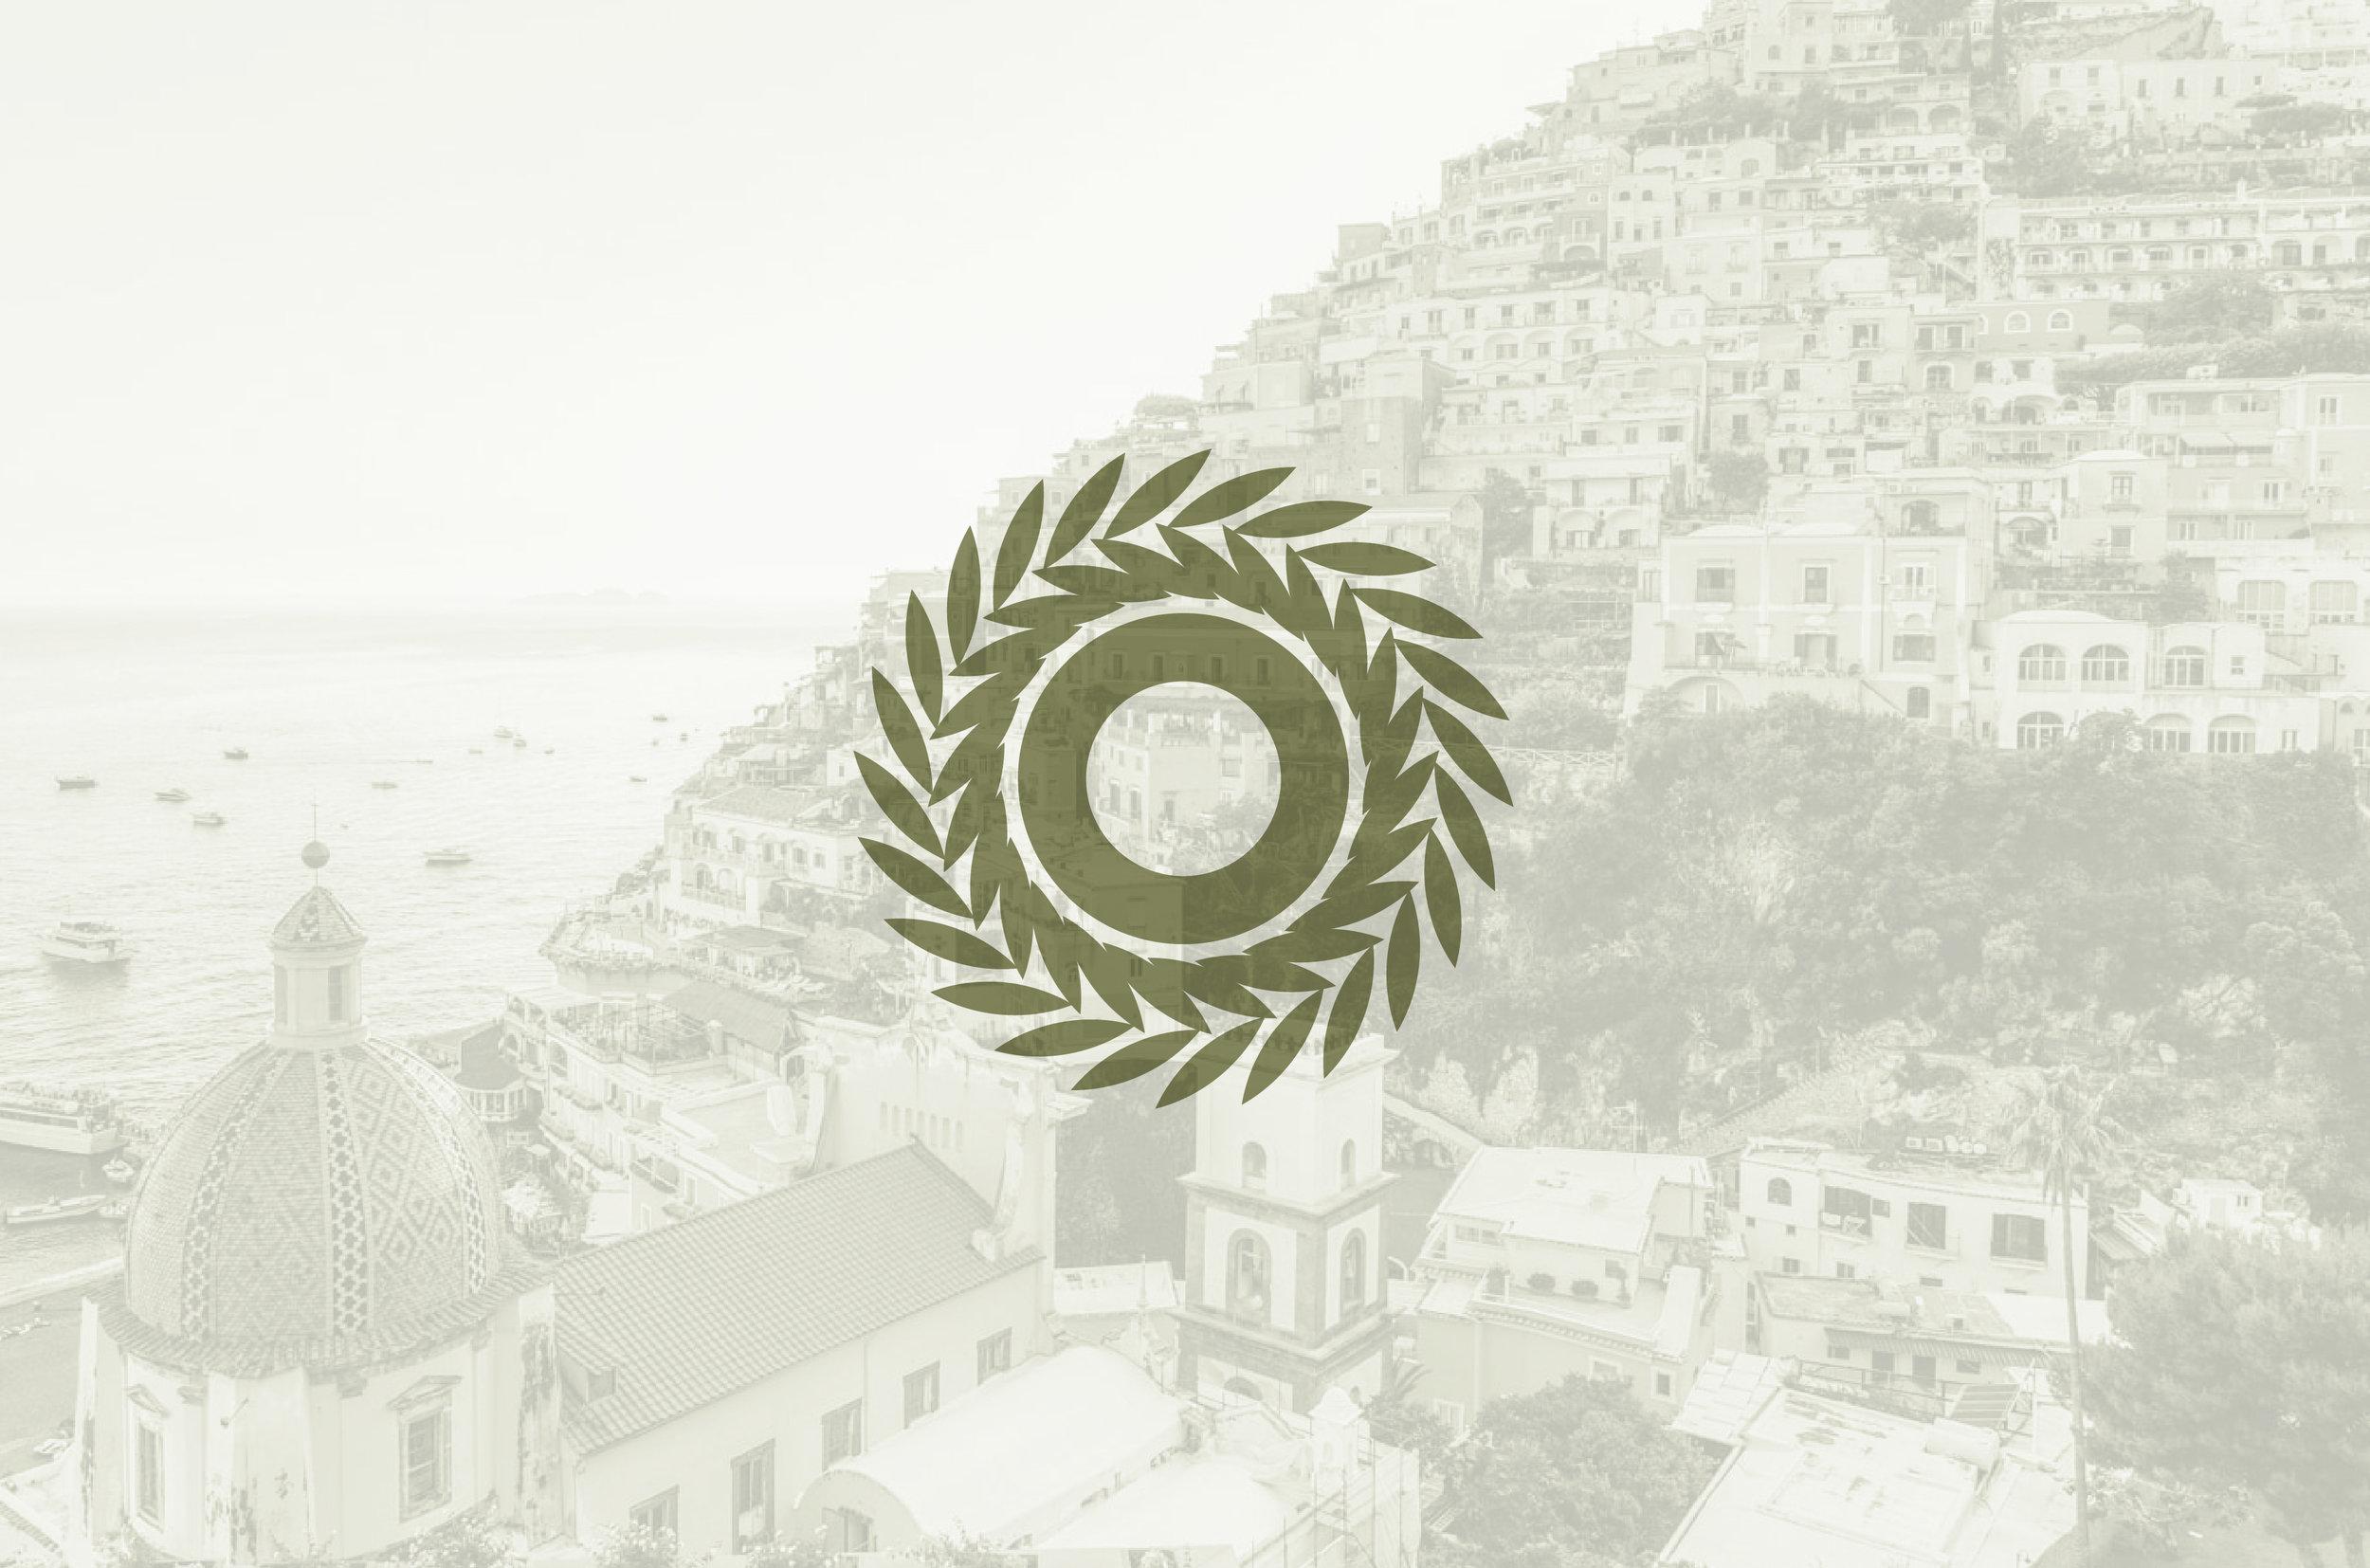 Olio_Logo-02.jpg